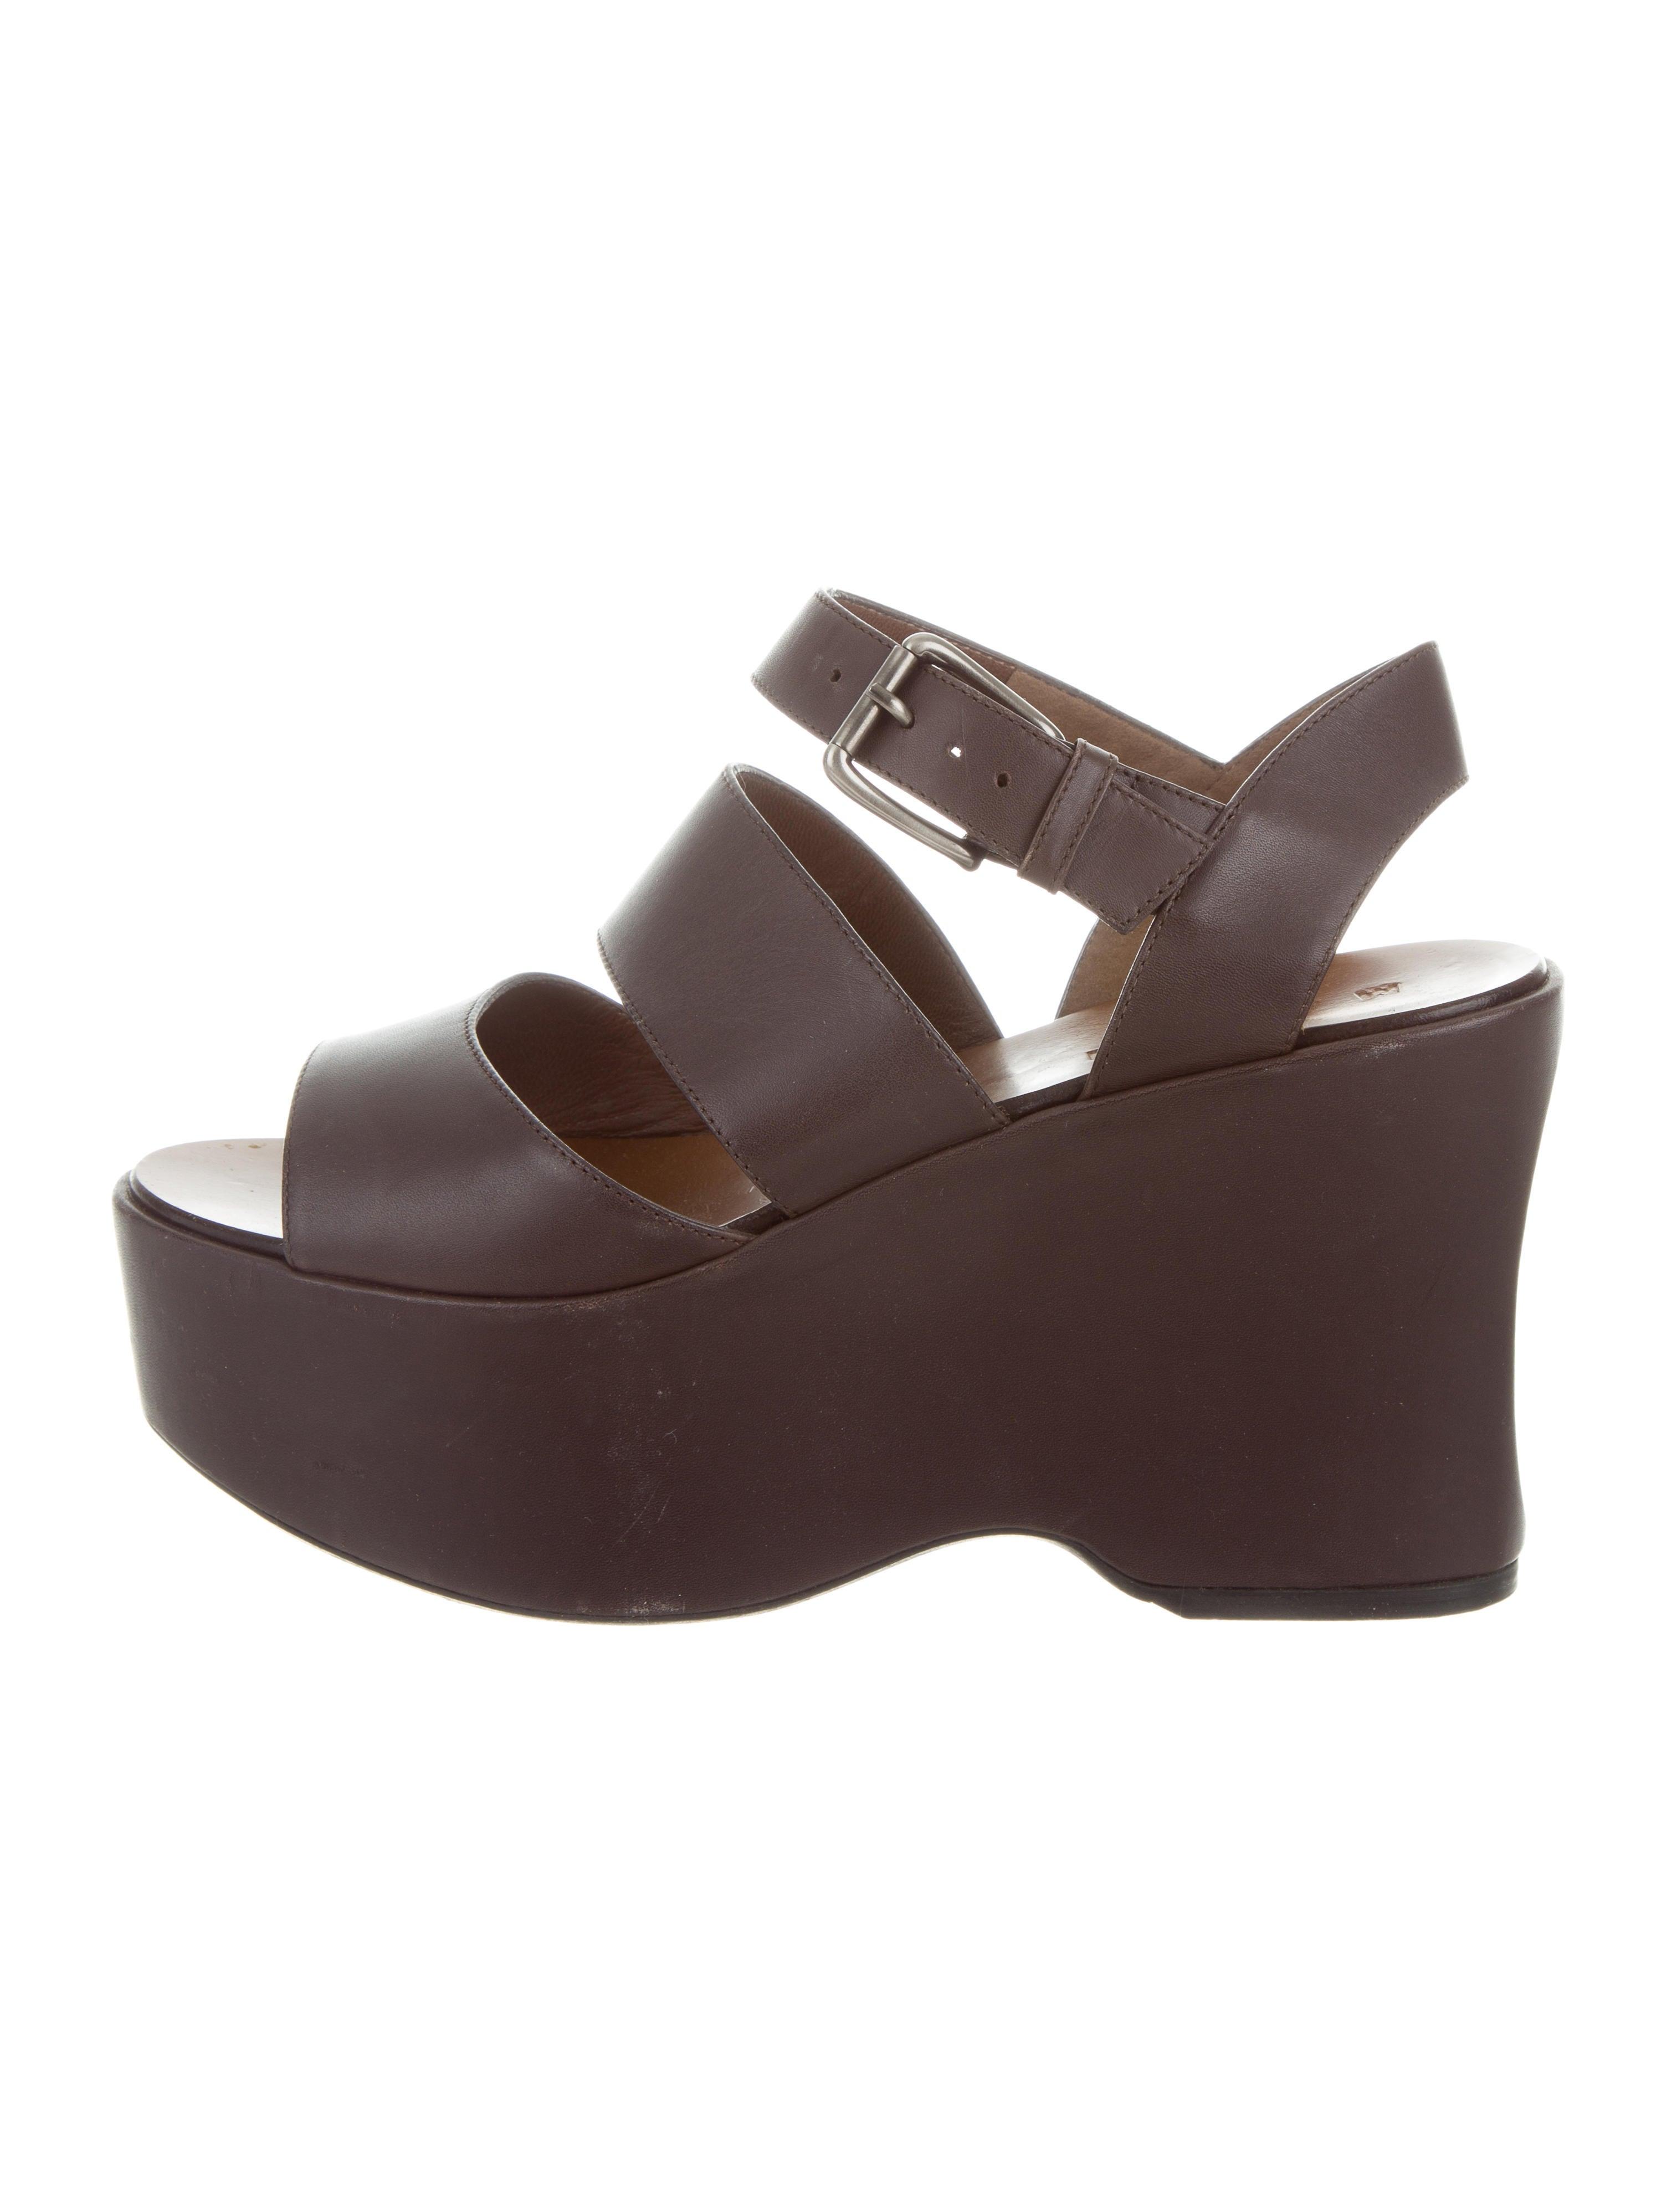 Manchester cheap online cheap online shop Marni Multistrap Platform Sandals sBwAIe